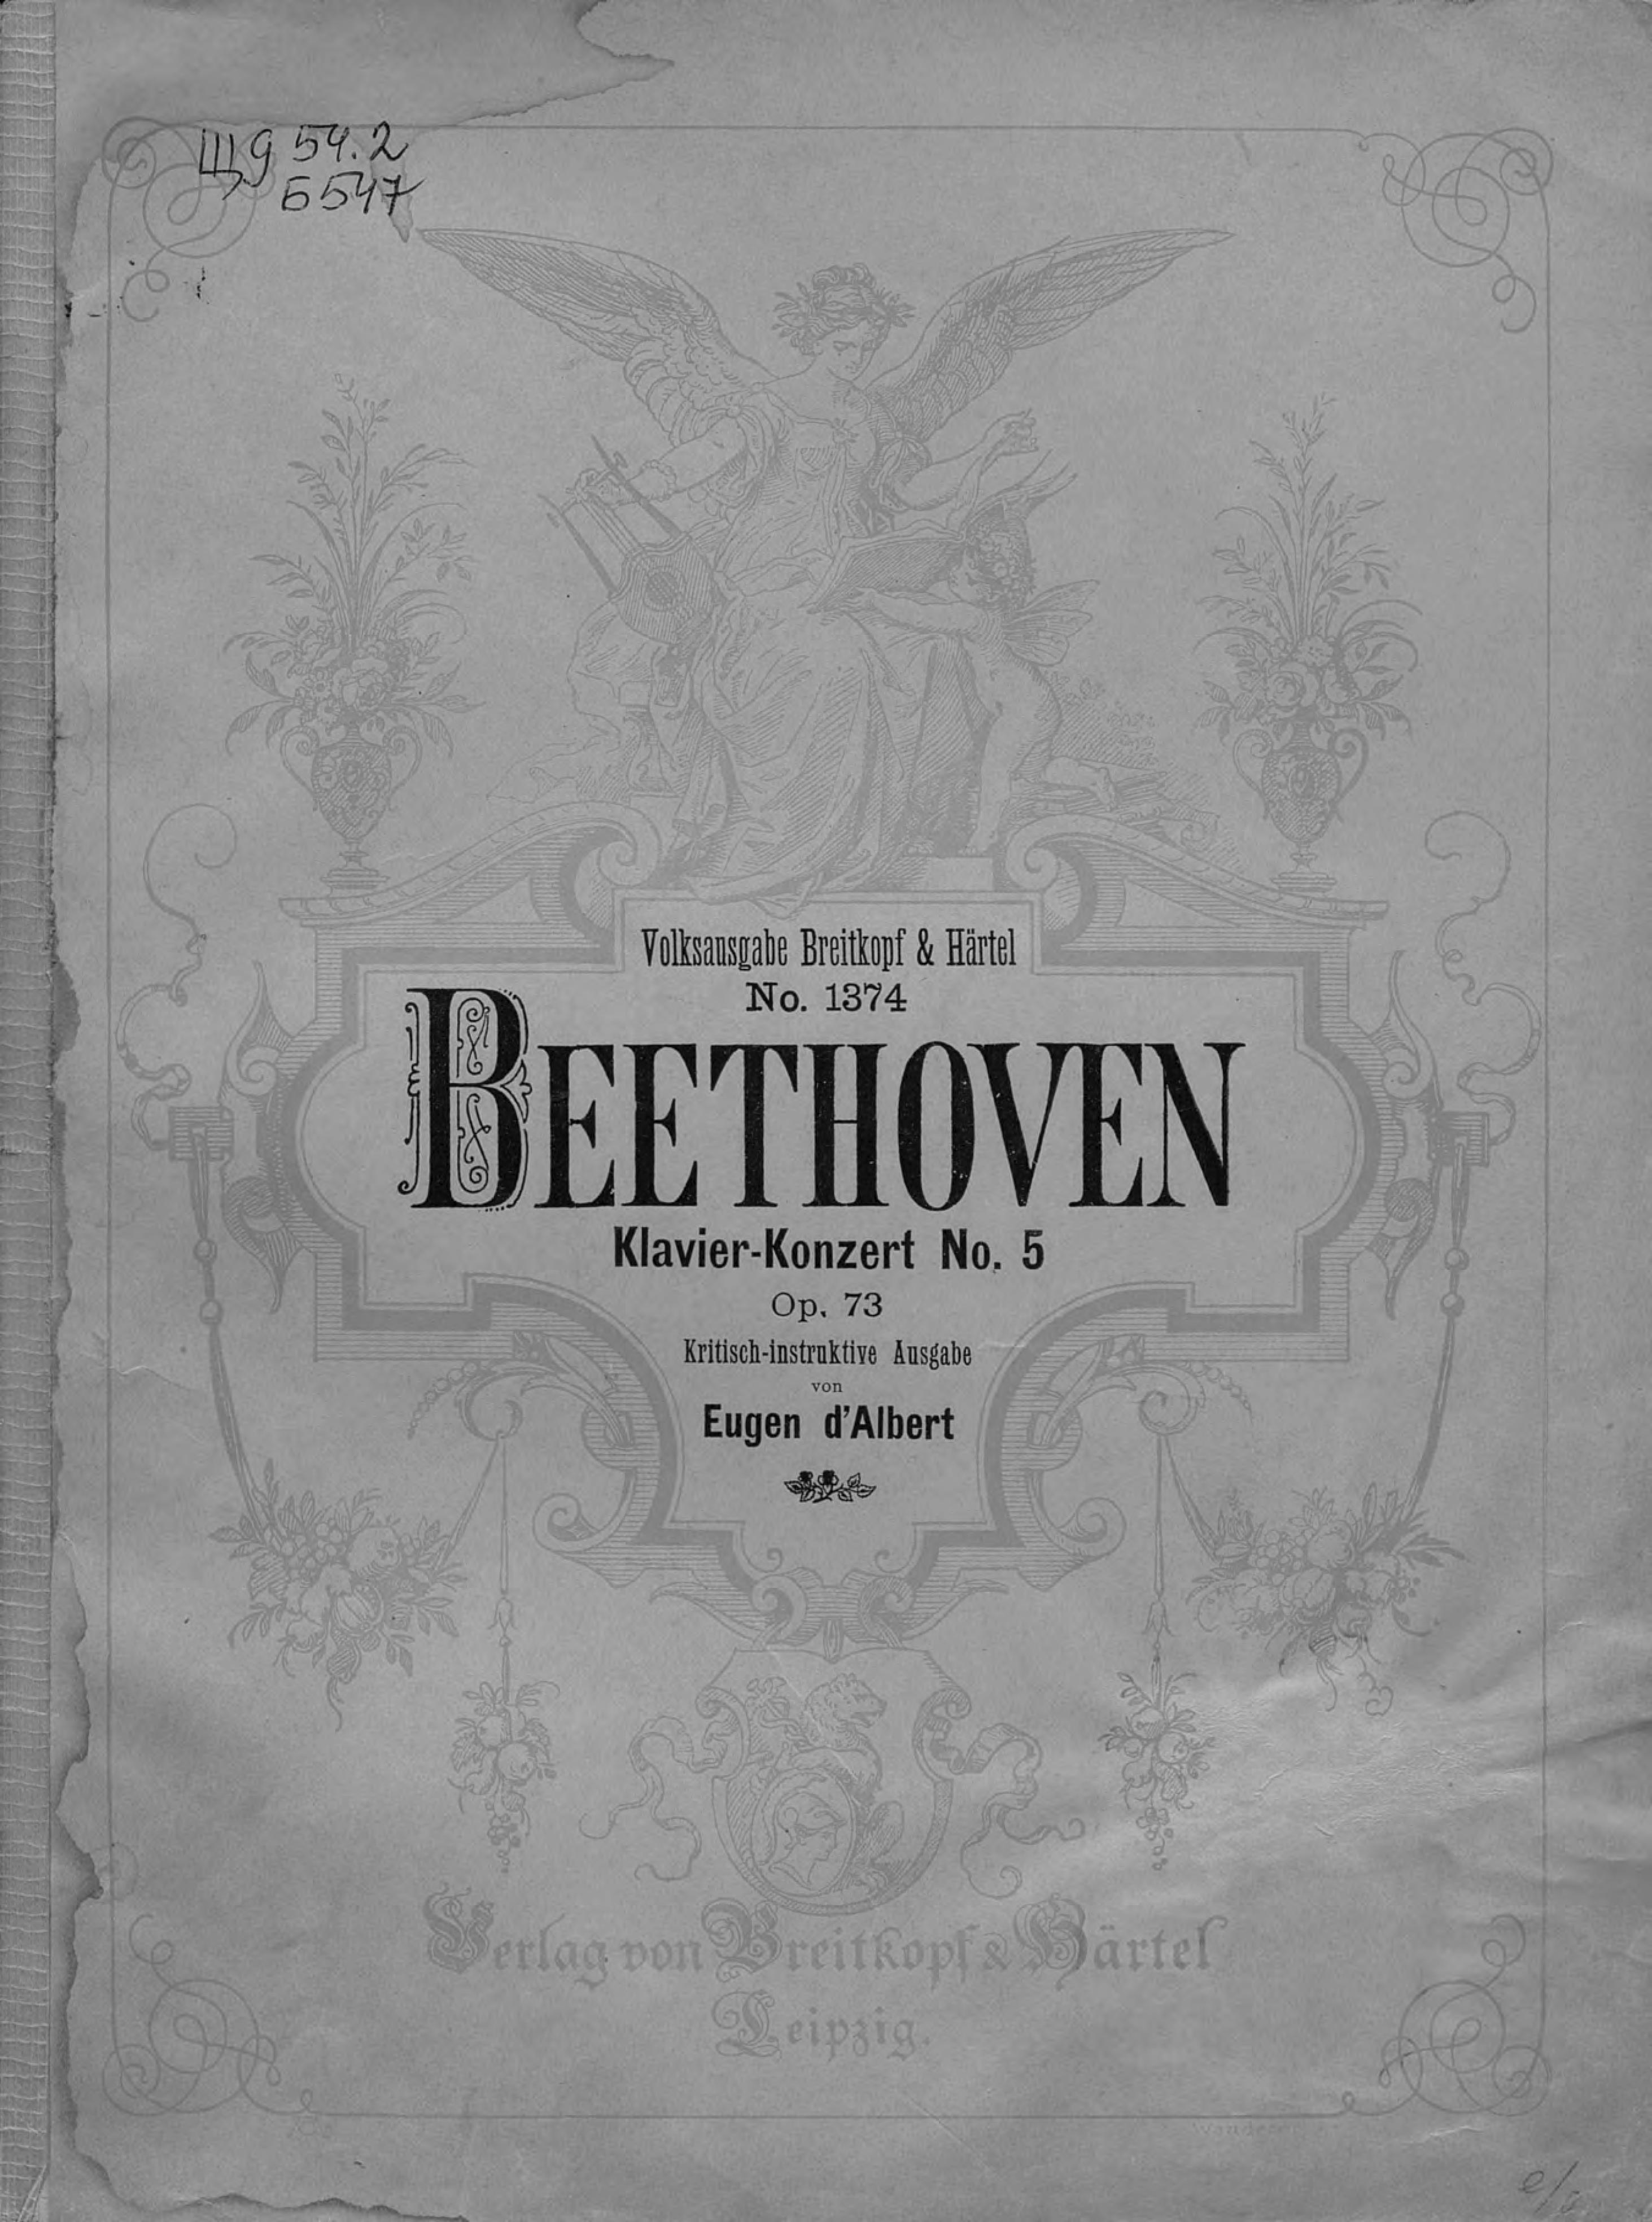 Людвиг ван Бетховен Klavier-Konzert № 5 op. 73 (Es-dur) g schumann 3 stucke fur klavier op 23